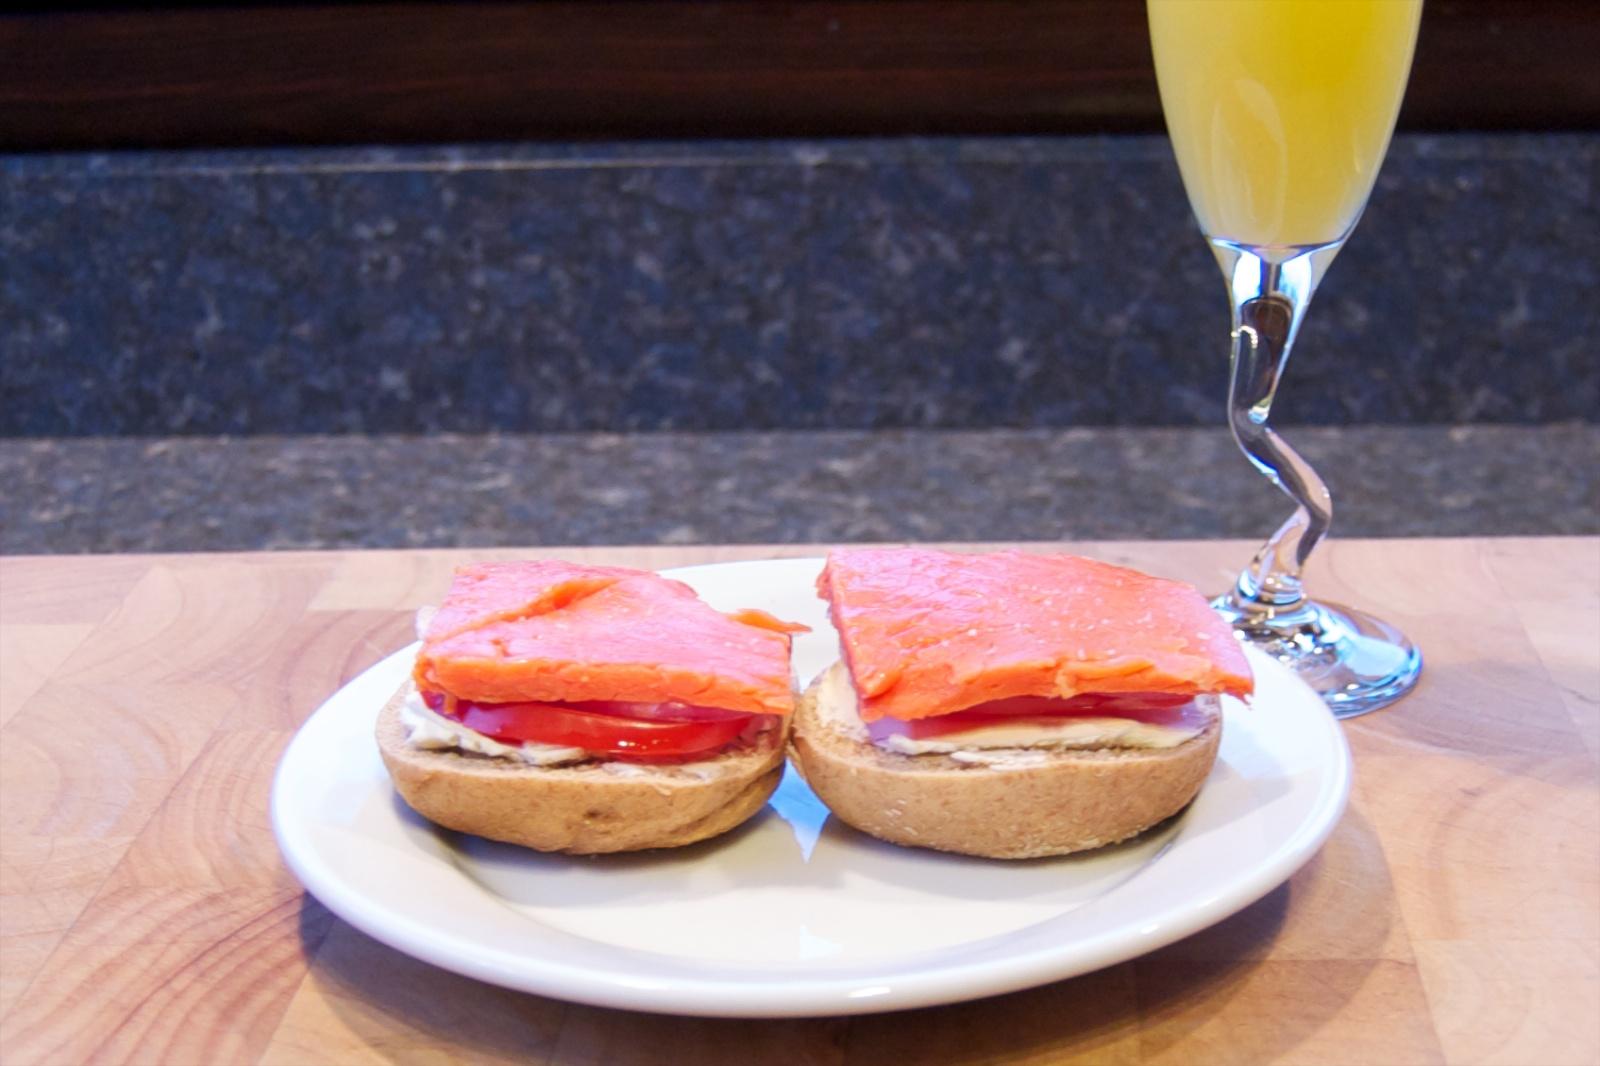 http://blog.rickk.com/food/2012/04/15/ate.2012.04.15.b.jpg